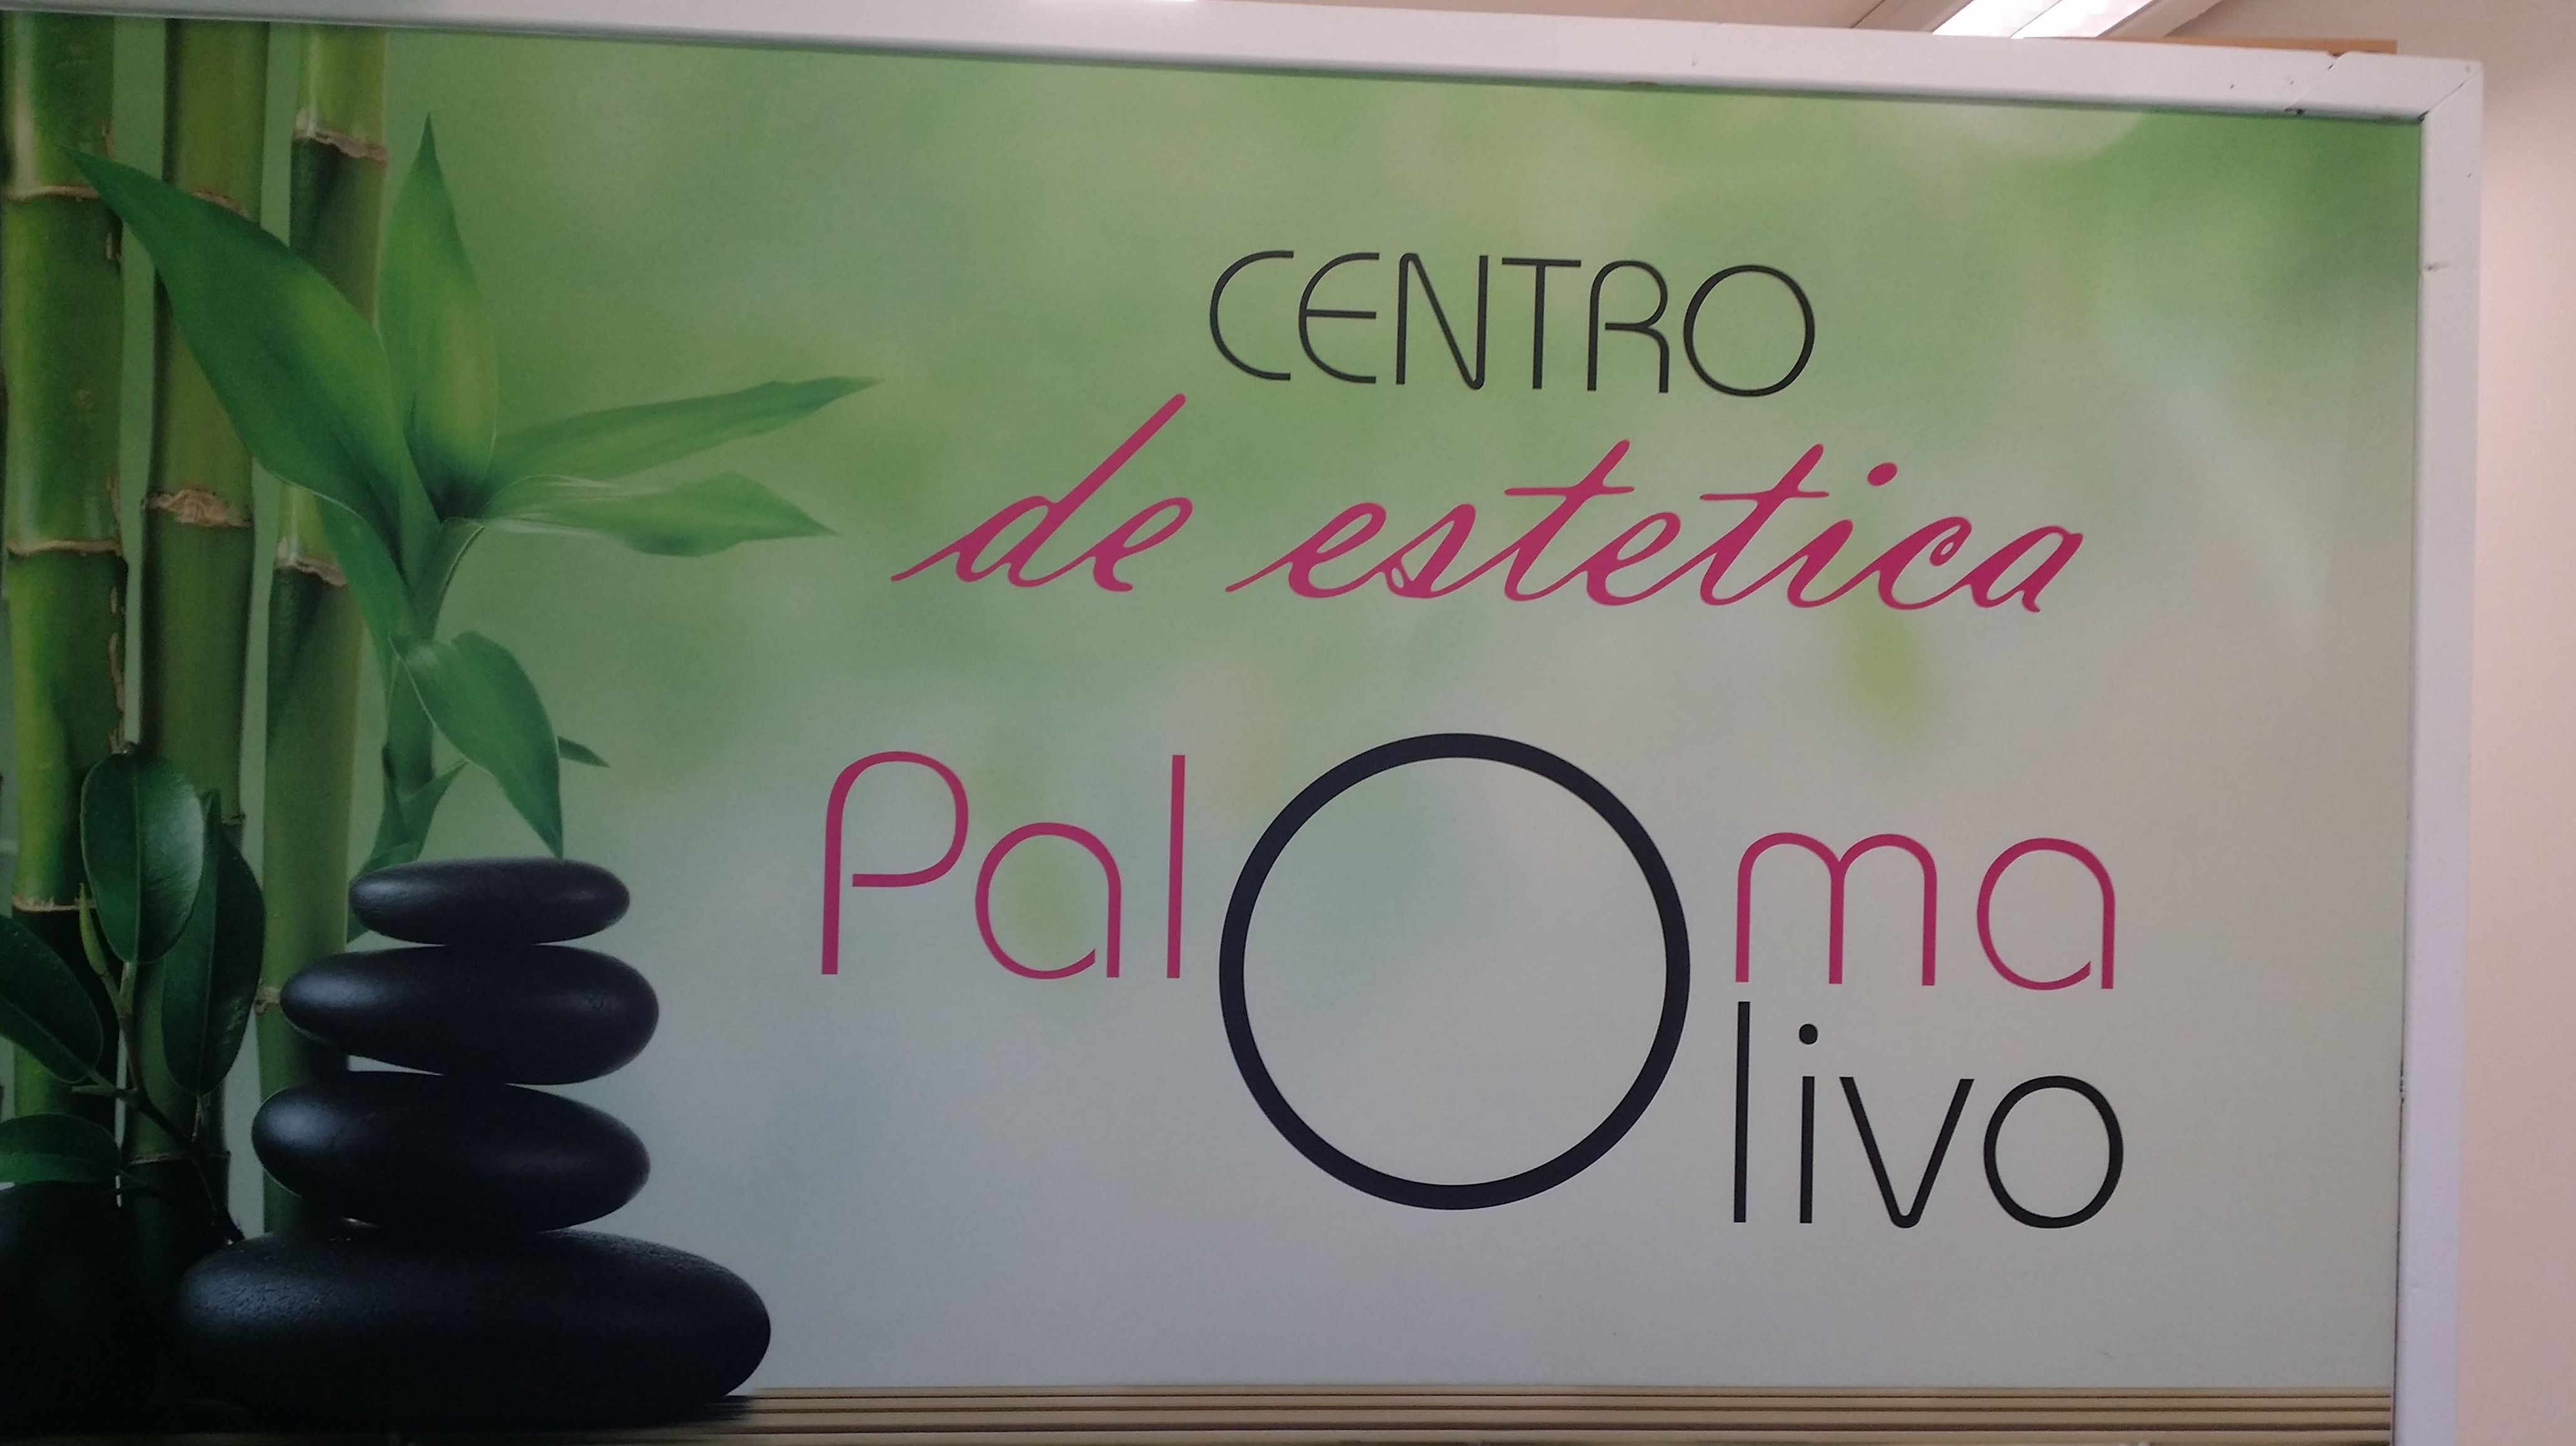 Centro de estética Paloma Oliva en Carabanchel